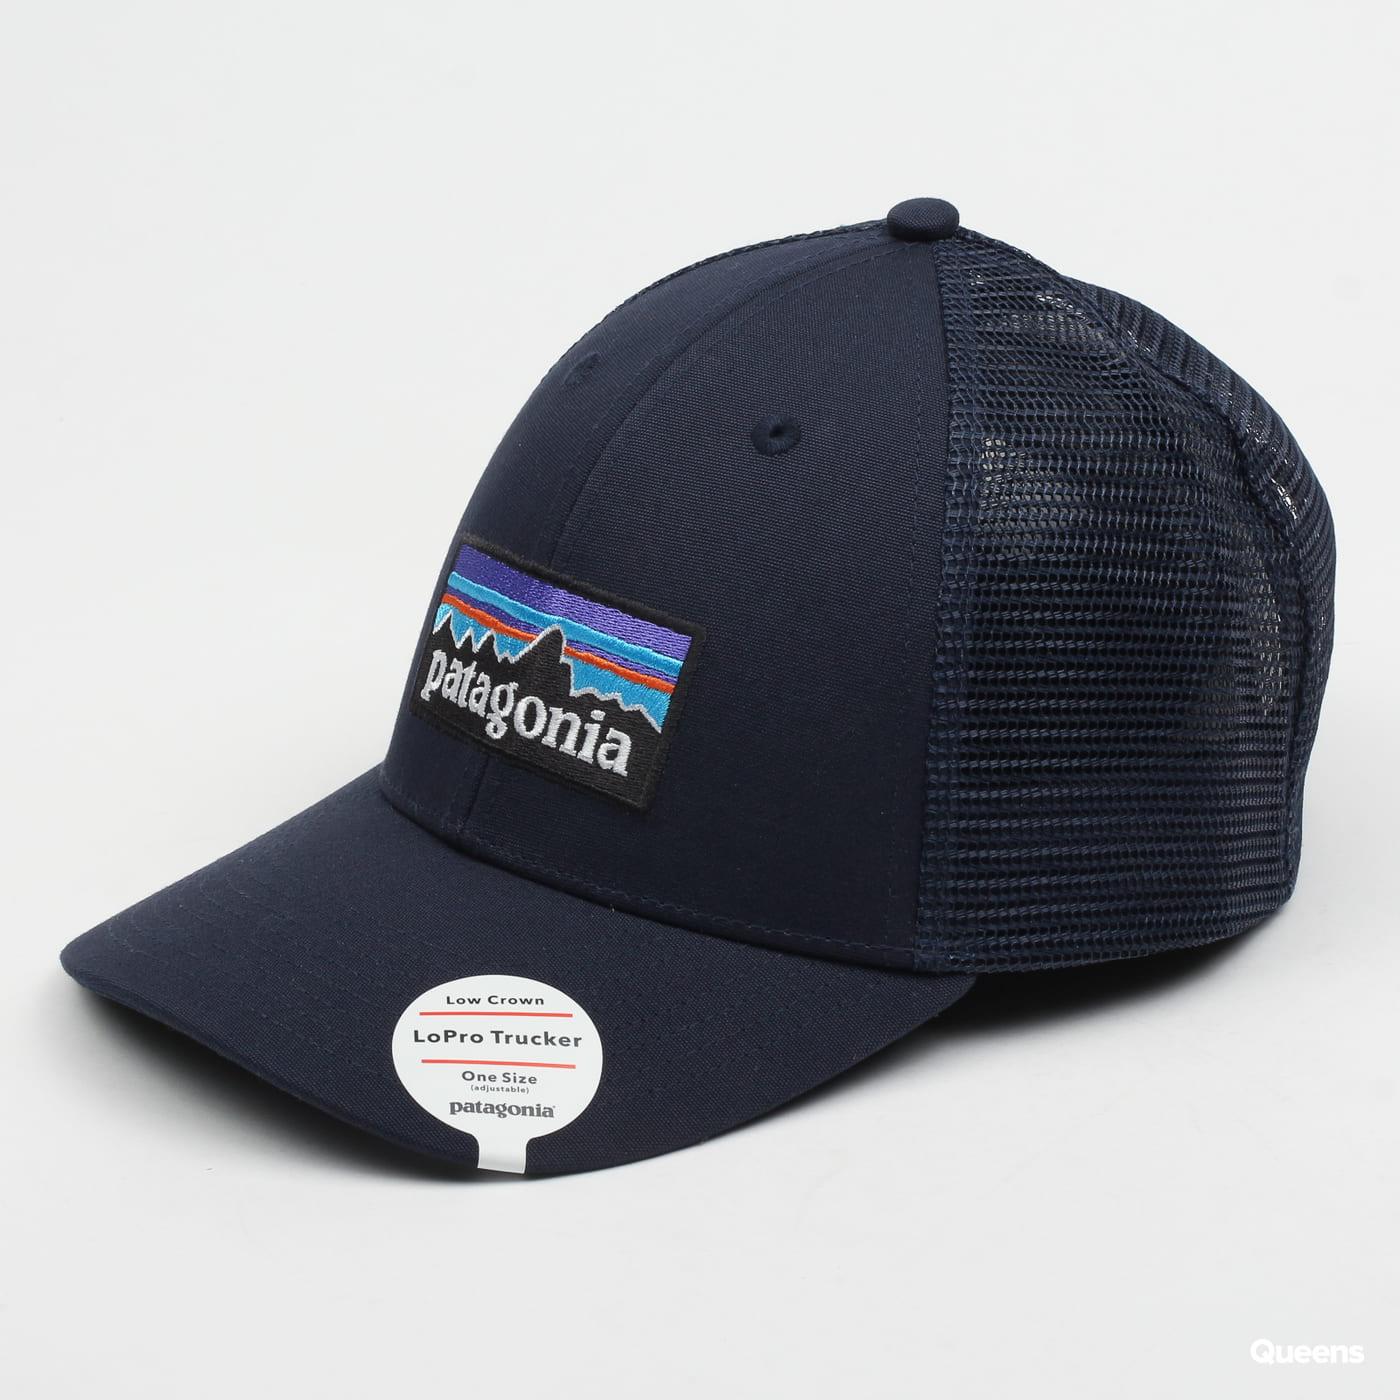 Patagonia P6 LoPro Trucker Hat Marine